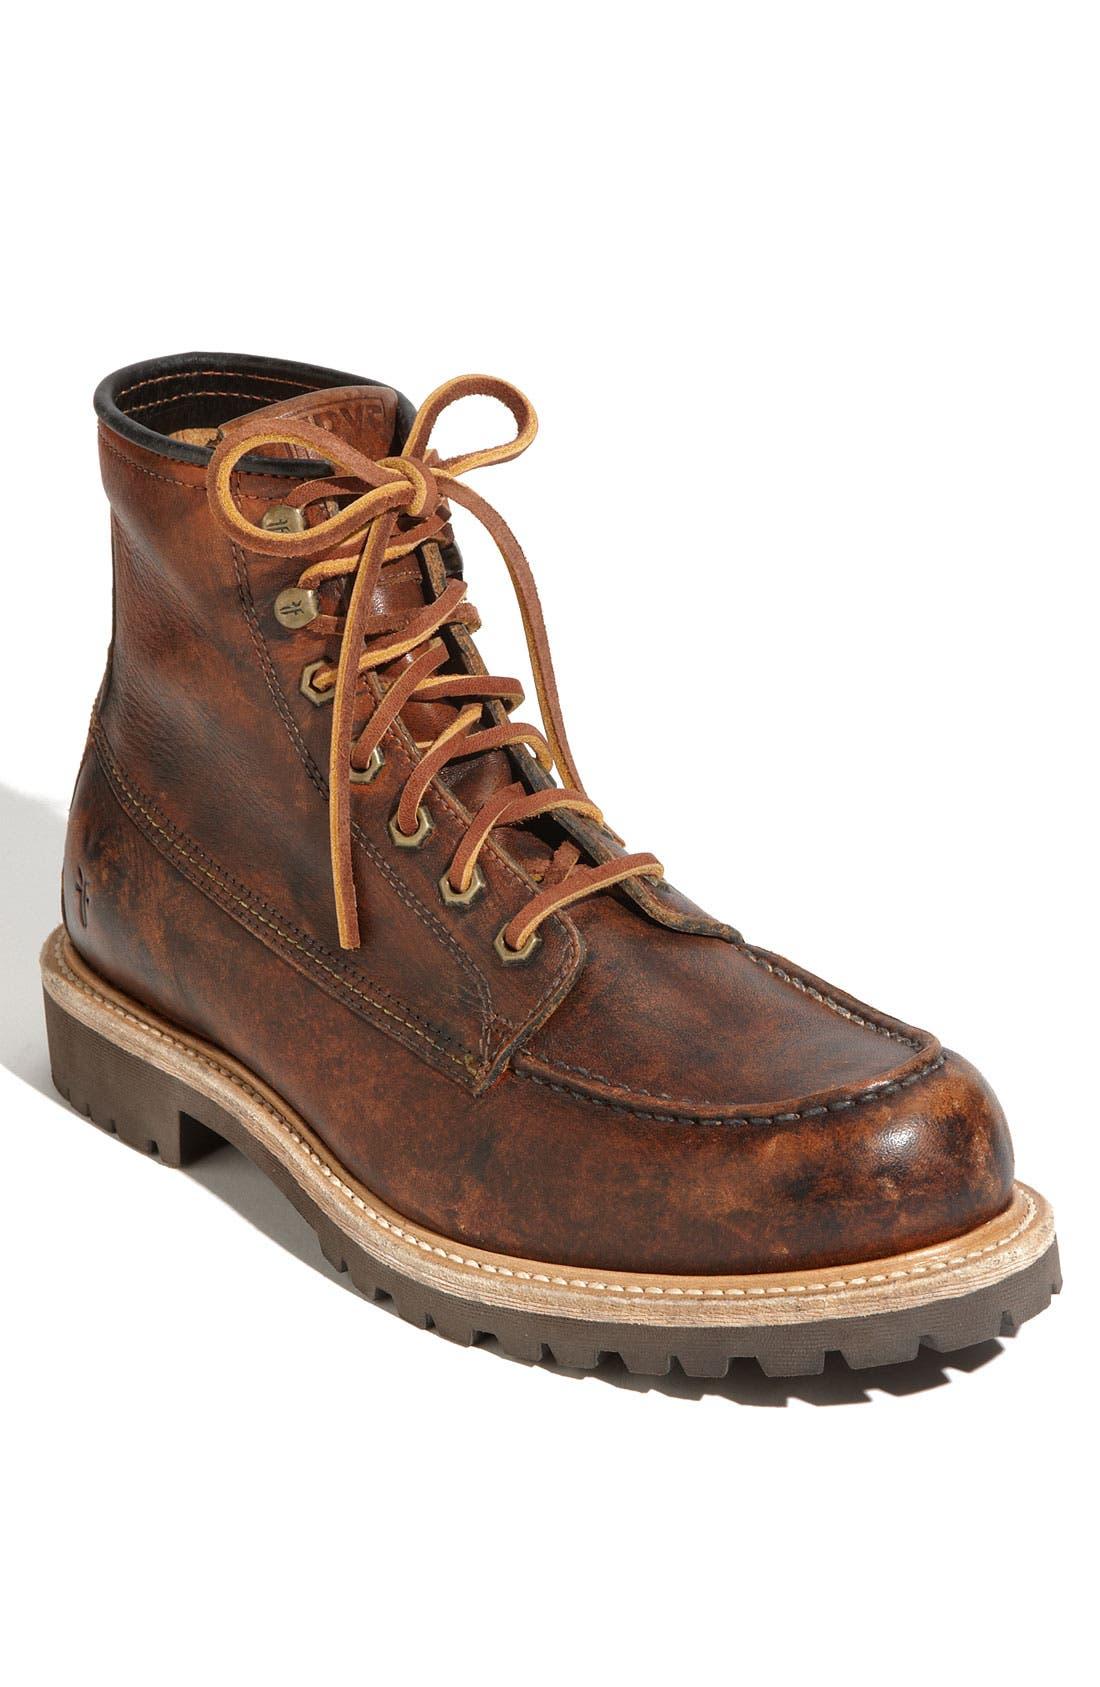 Alternate Image 1 Selected - Frye 'Dakota' Boot